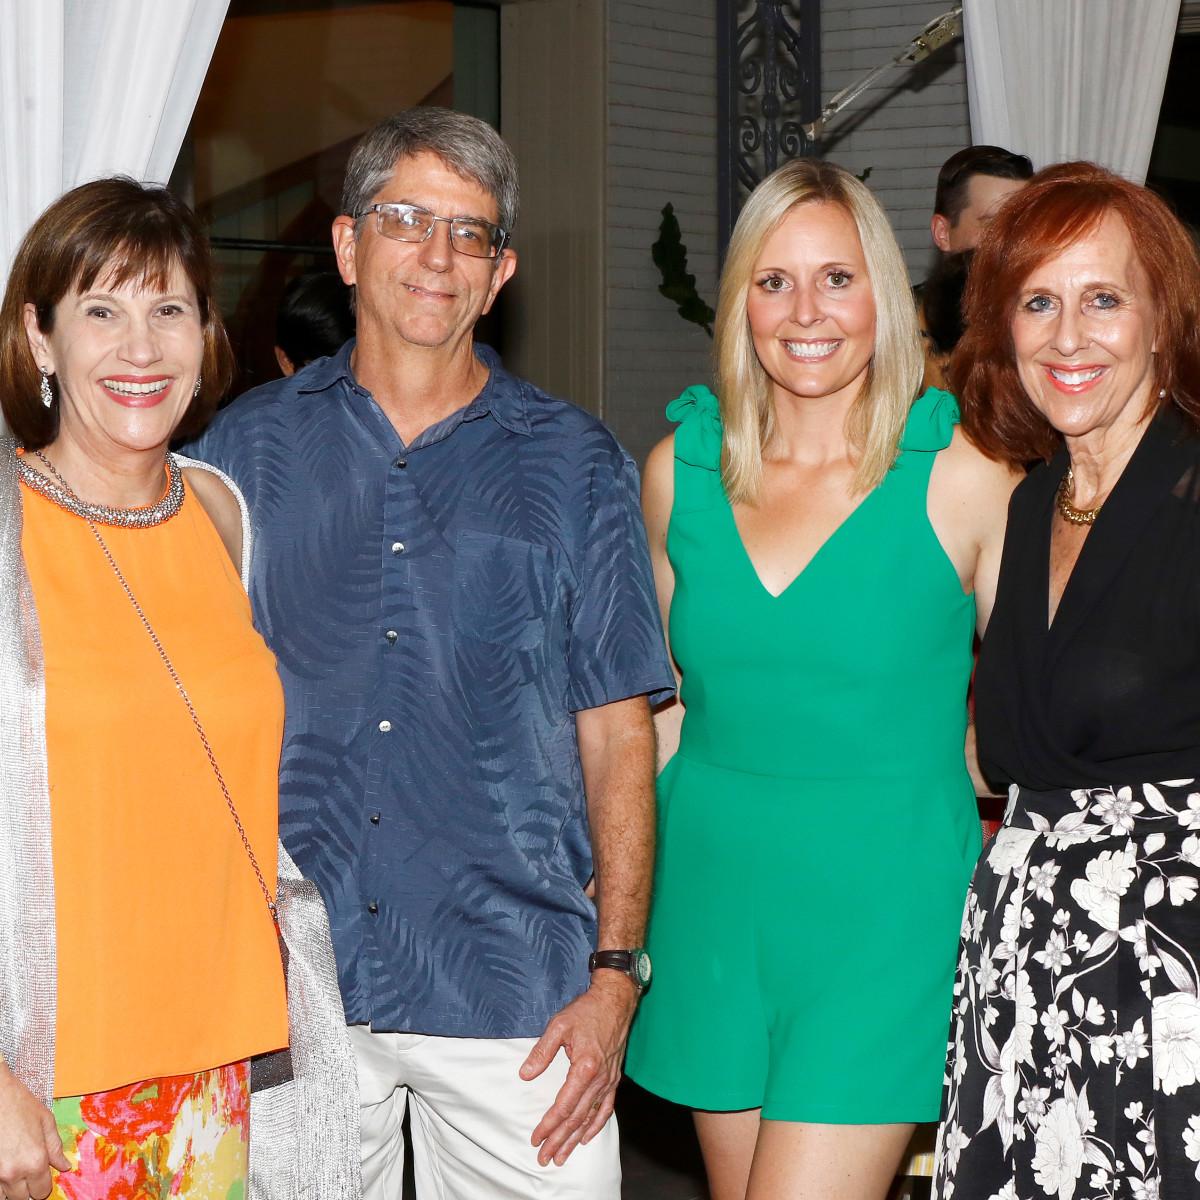 Jeanne Clark, Jerry Clark, Lora Farris, Susan Farris